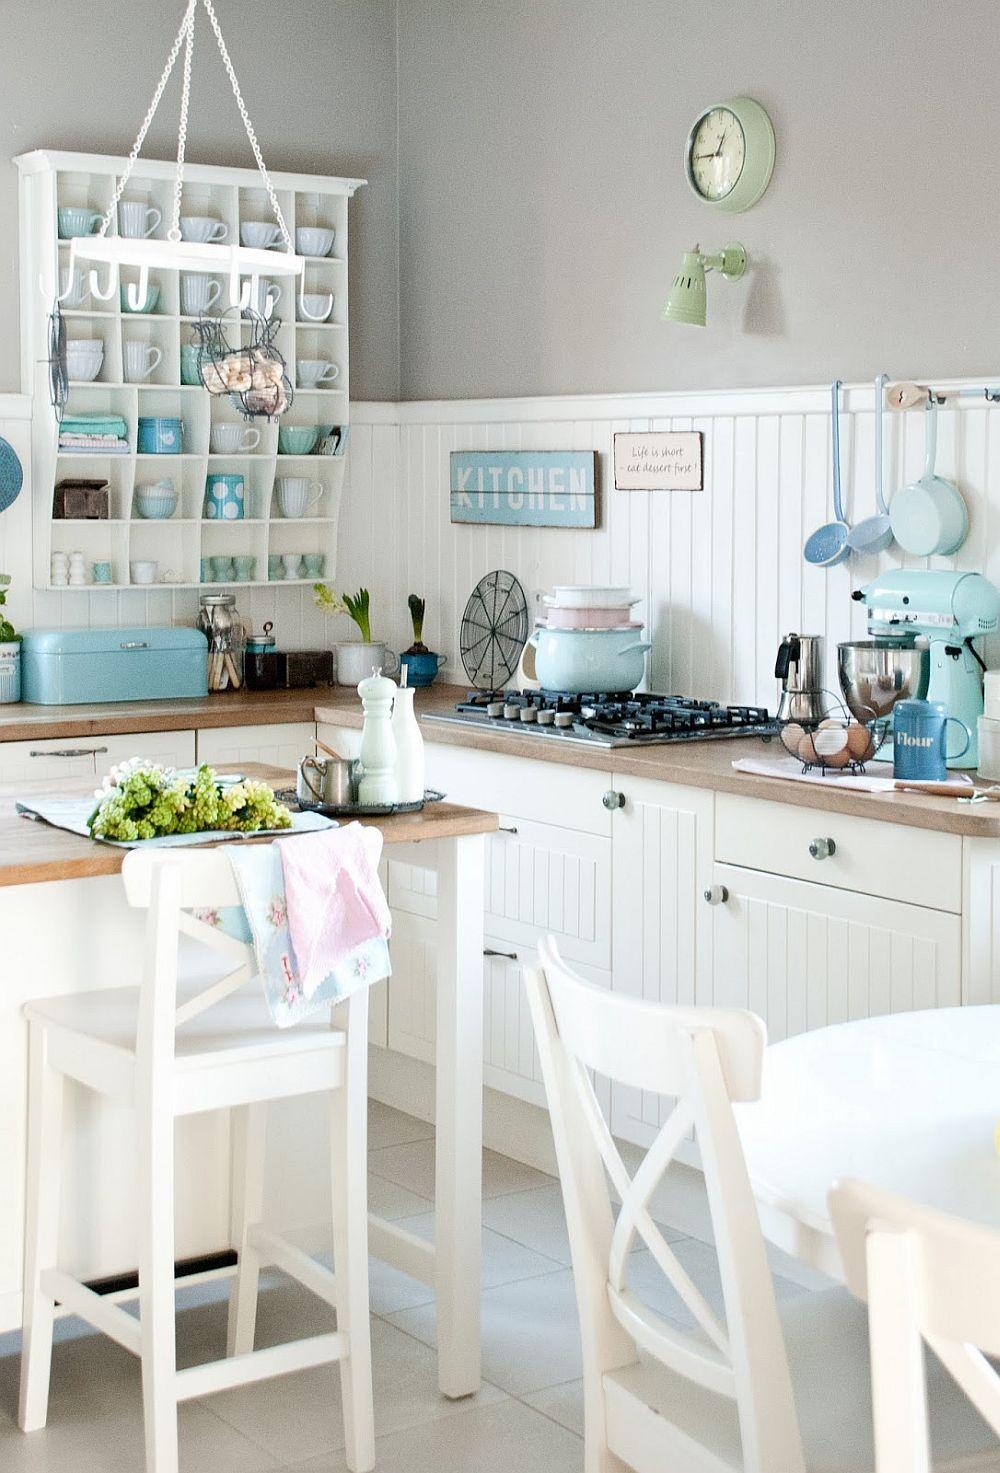 adelaparvu.com despre casa in stil scandinav, casa de blogger, Minty House, Foto Ewa Szymczak (13)